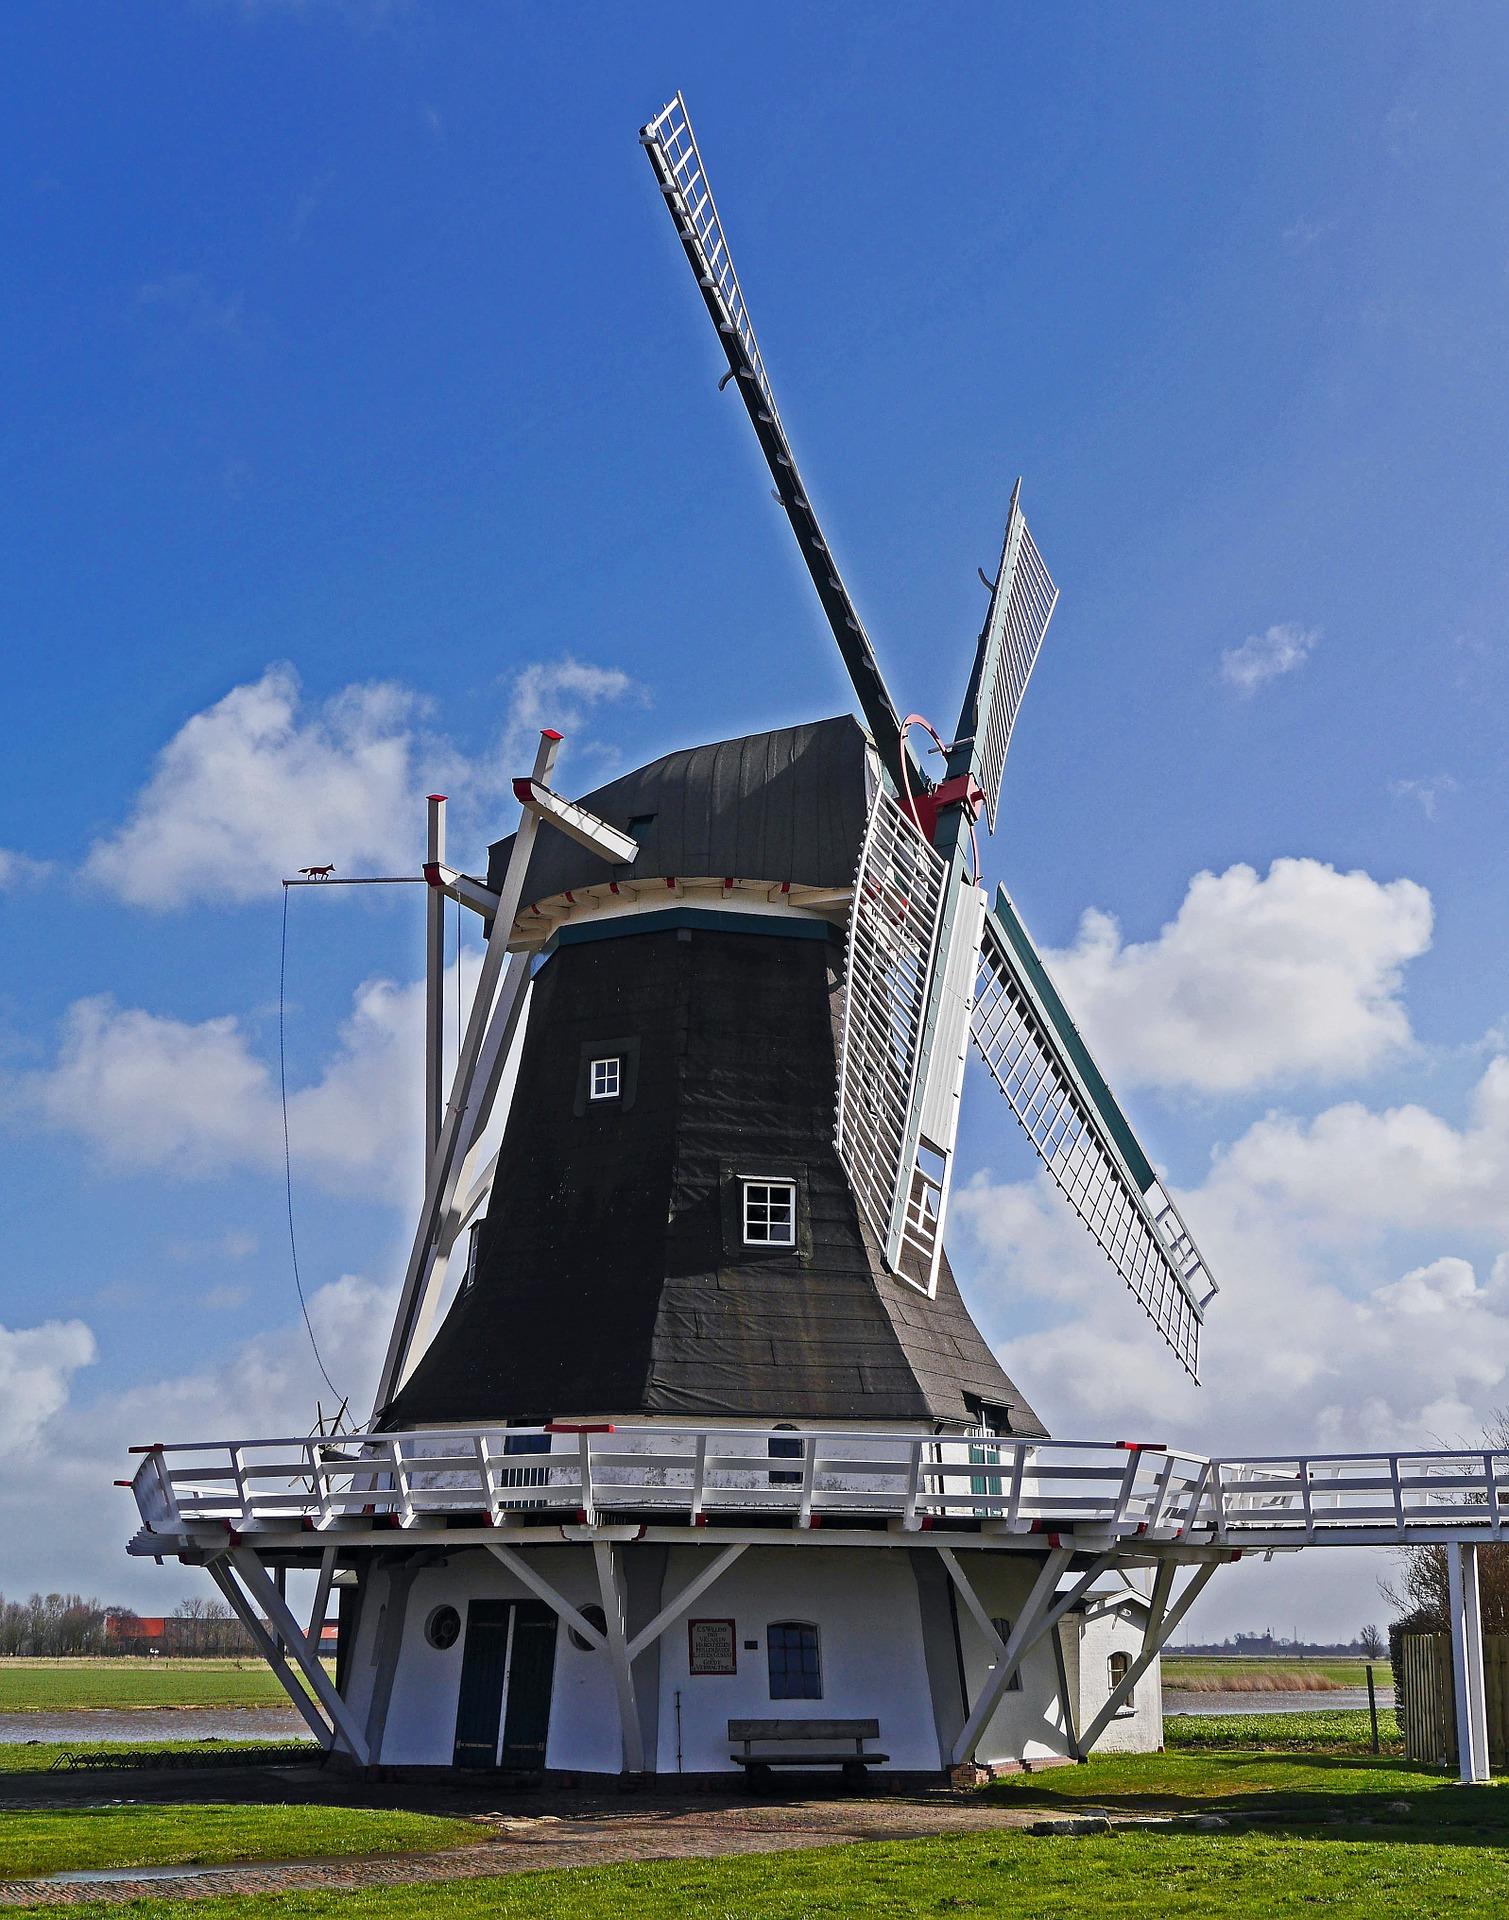 Moulin, vent, Frise orientale, Sky, nuages - écran HD wallpapers - Professor-falken.com